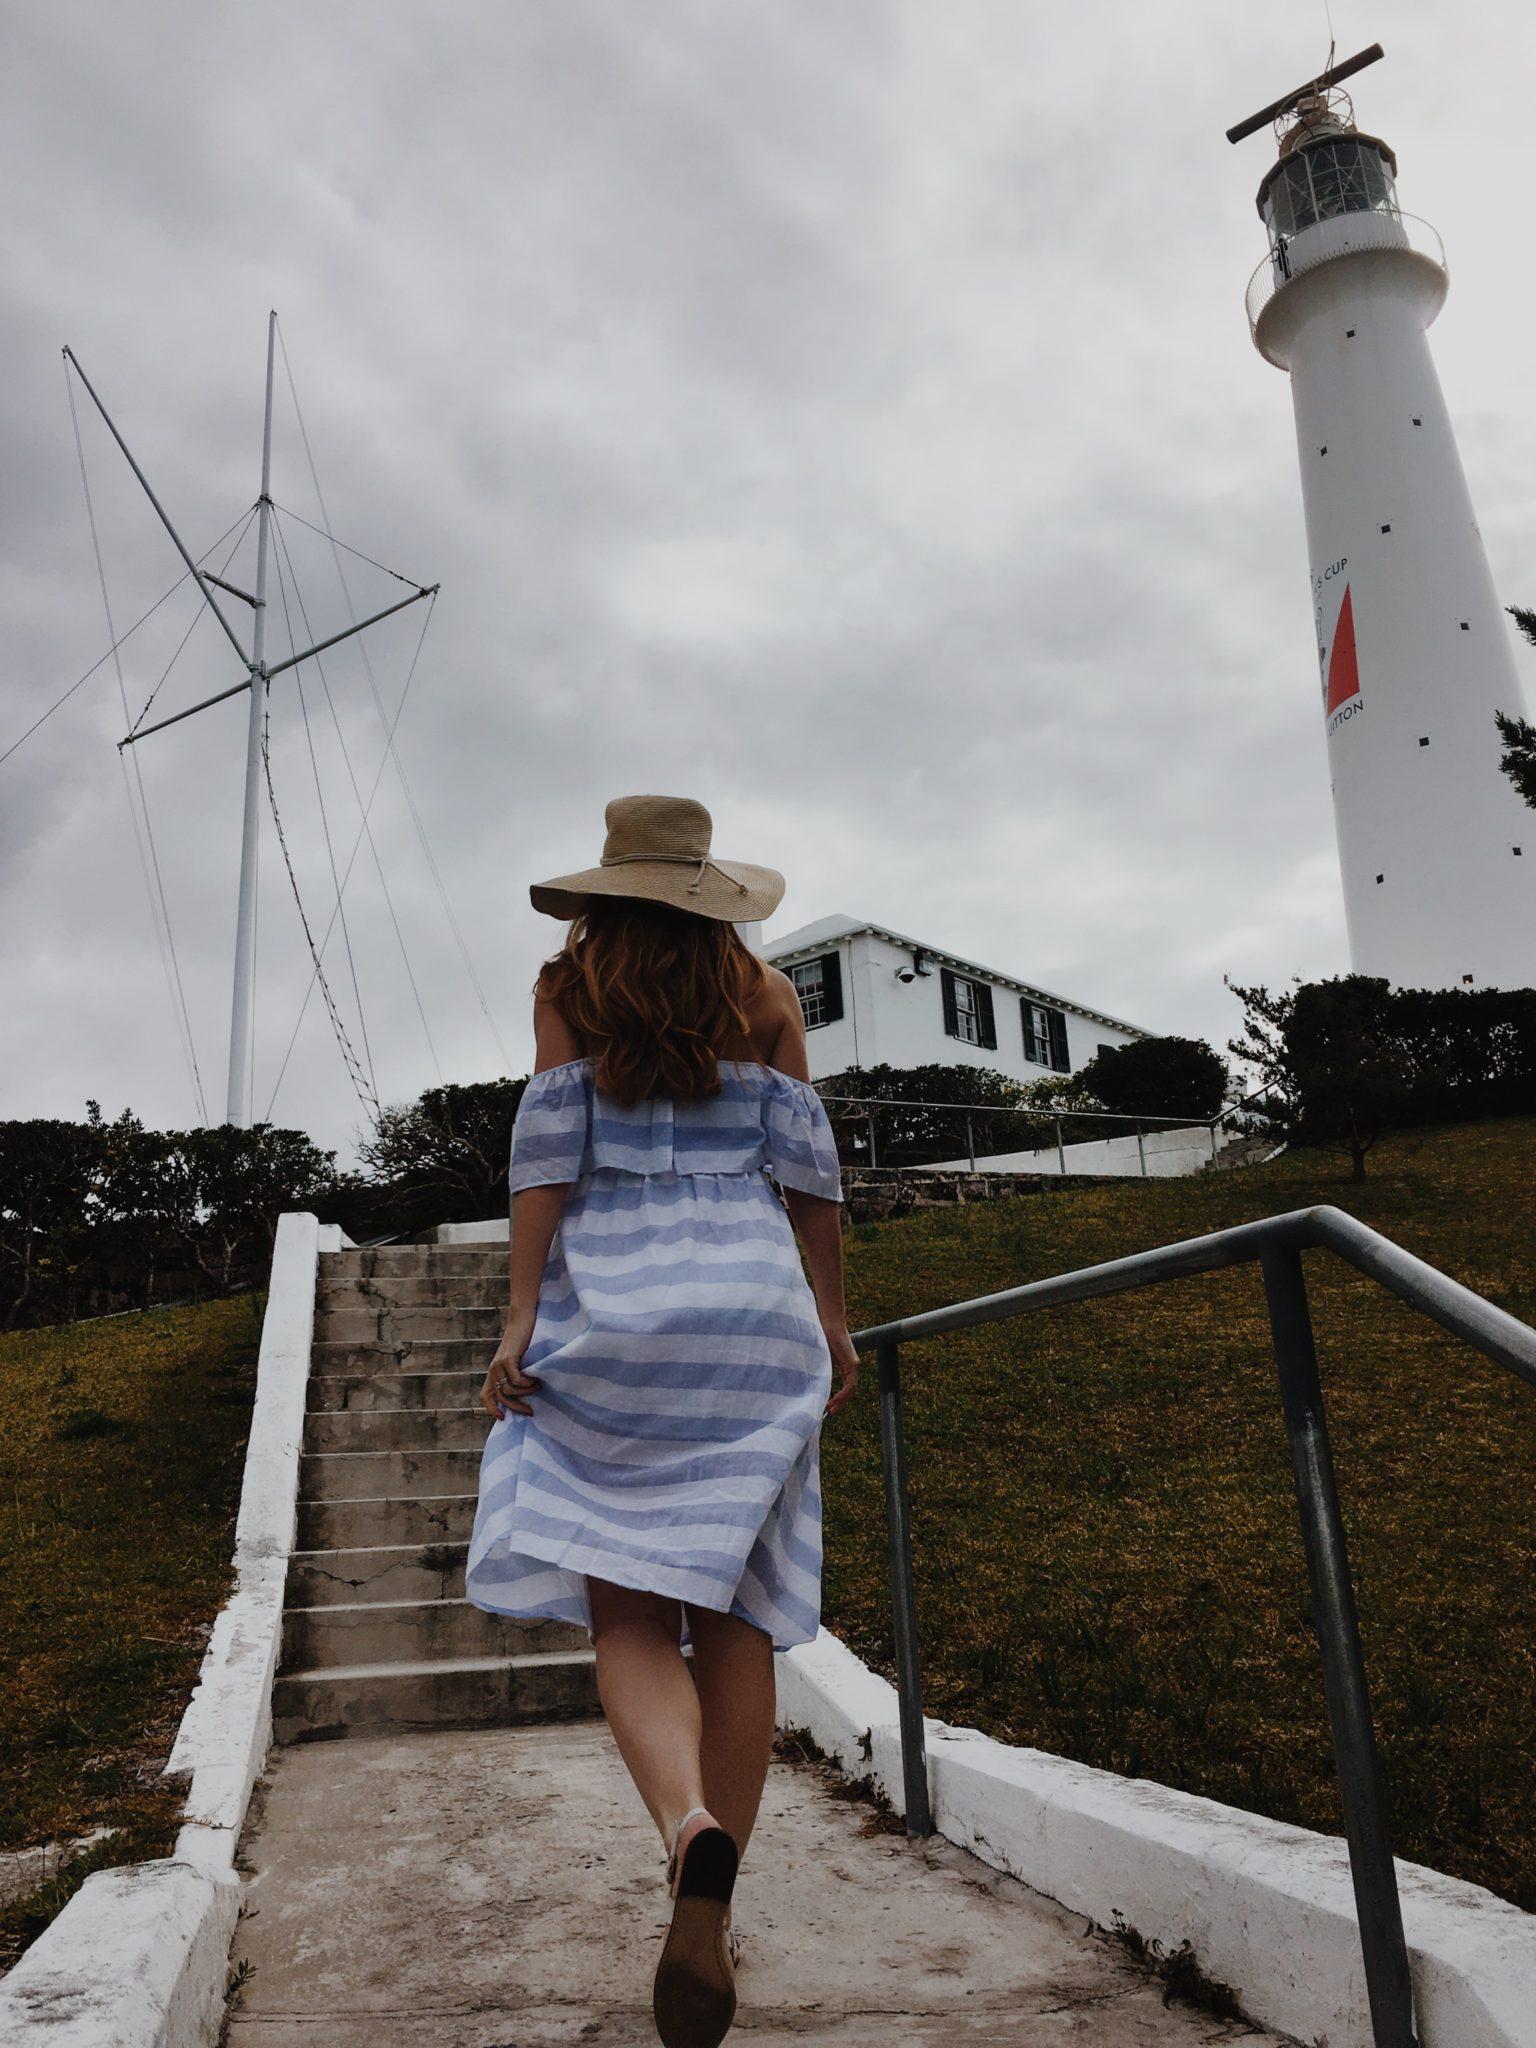 Bermuda: Leave the Light On